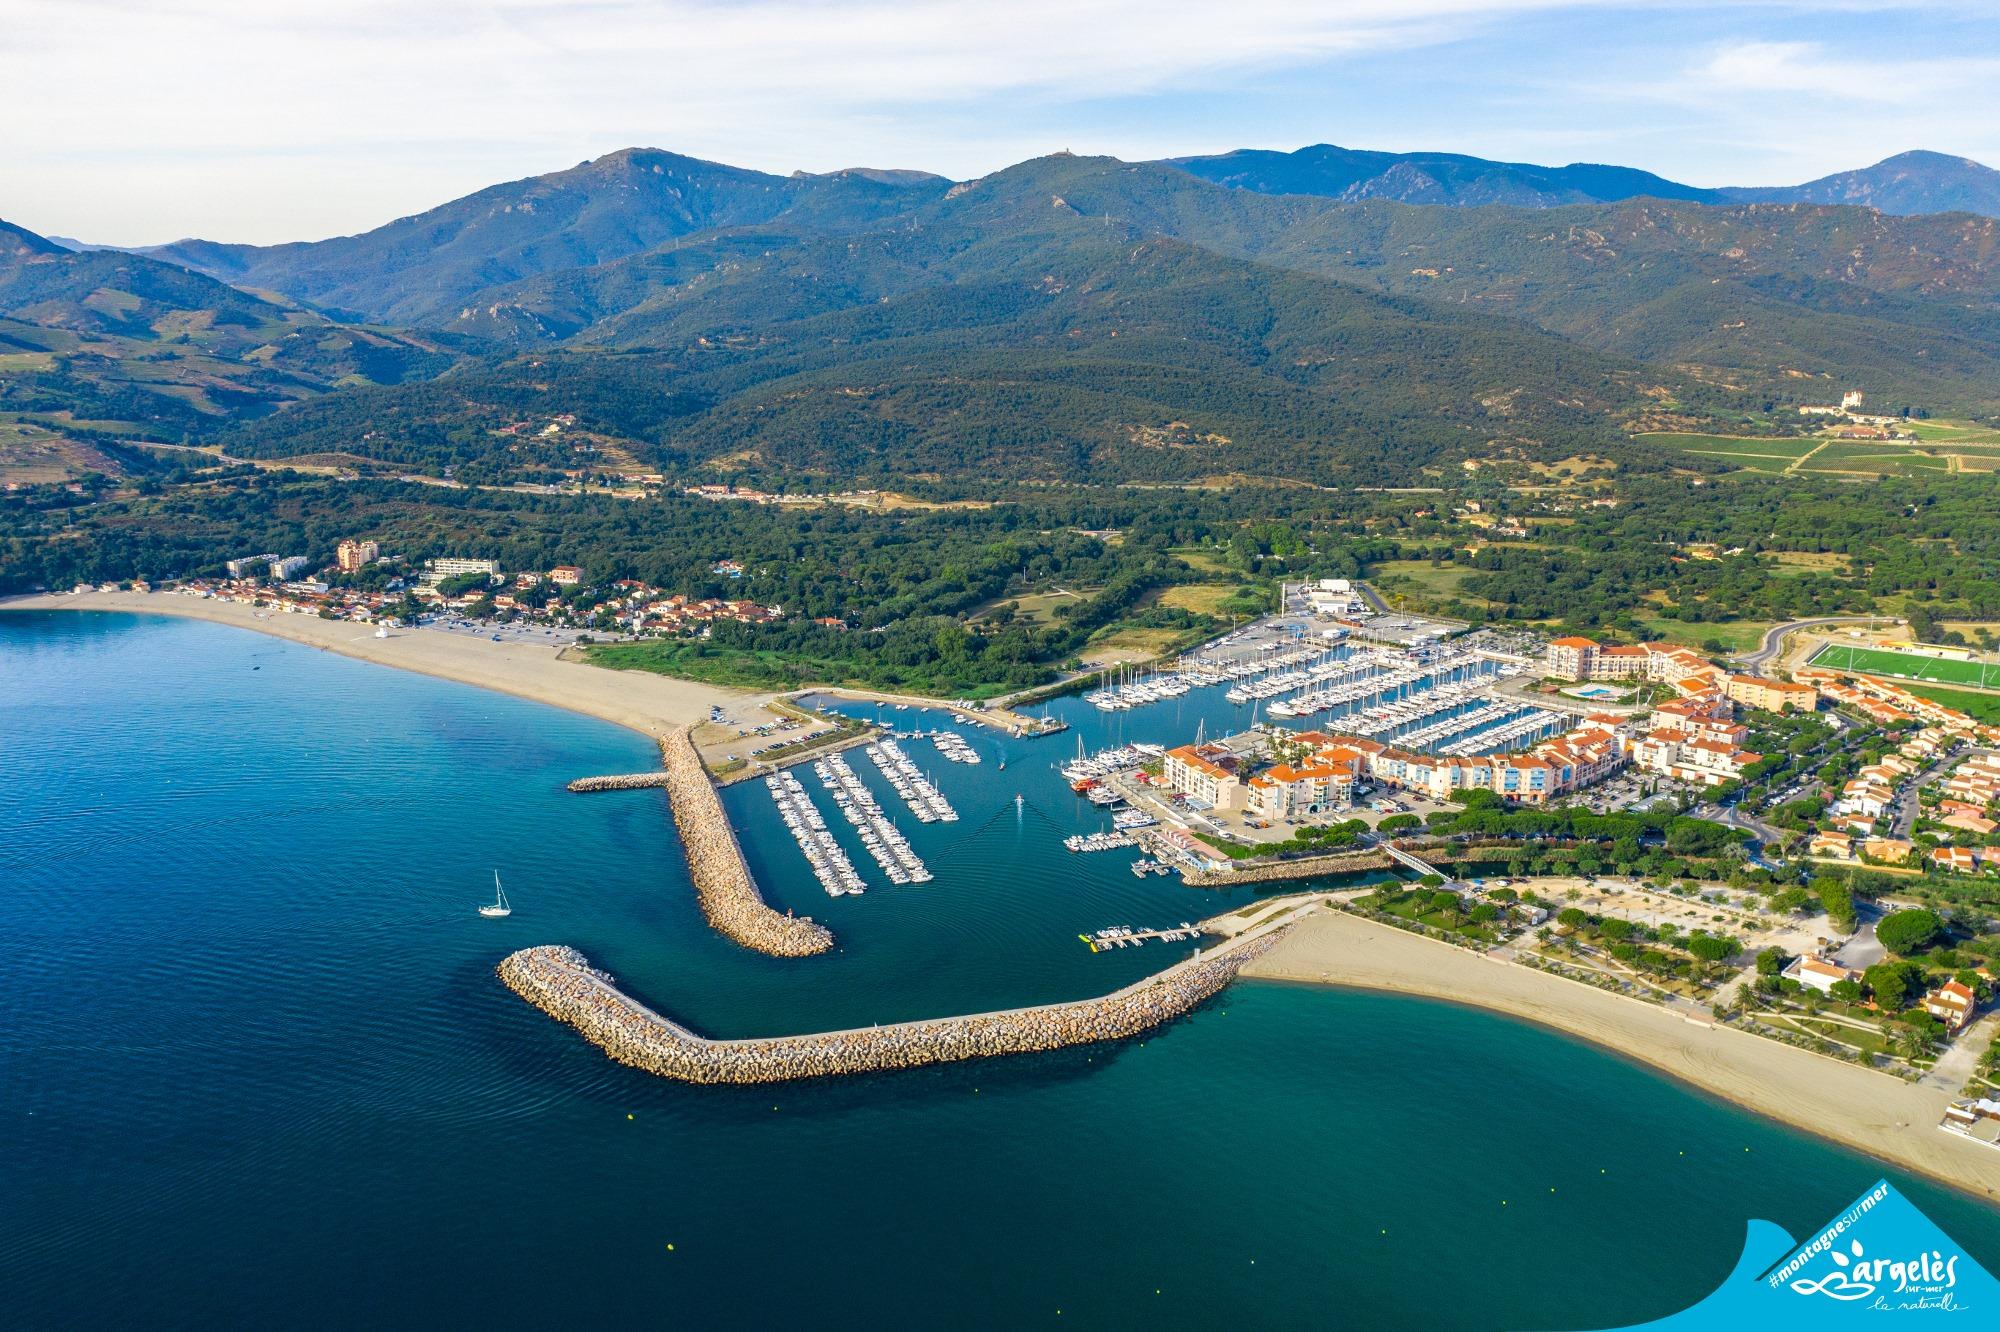 tourisme occitanie pays catalan vacances